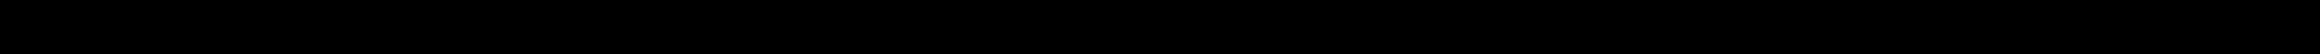 NGK 90048-51158-000, 90048-51158-008, 98079-5514E, 98079-5514E-H0, 98079-5515E Uždegimo žvakė